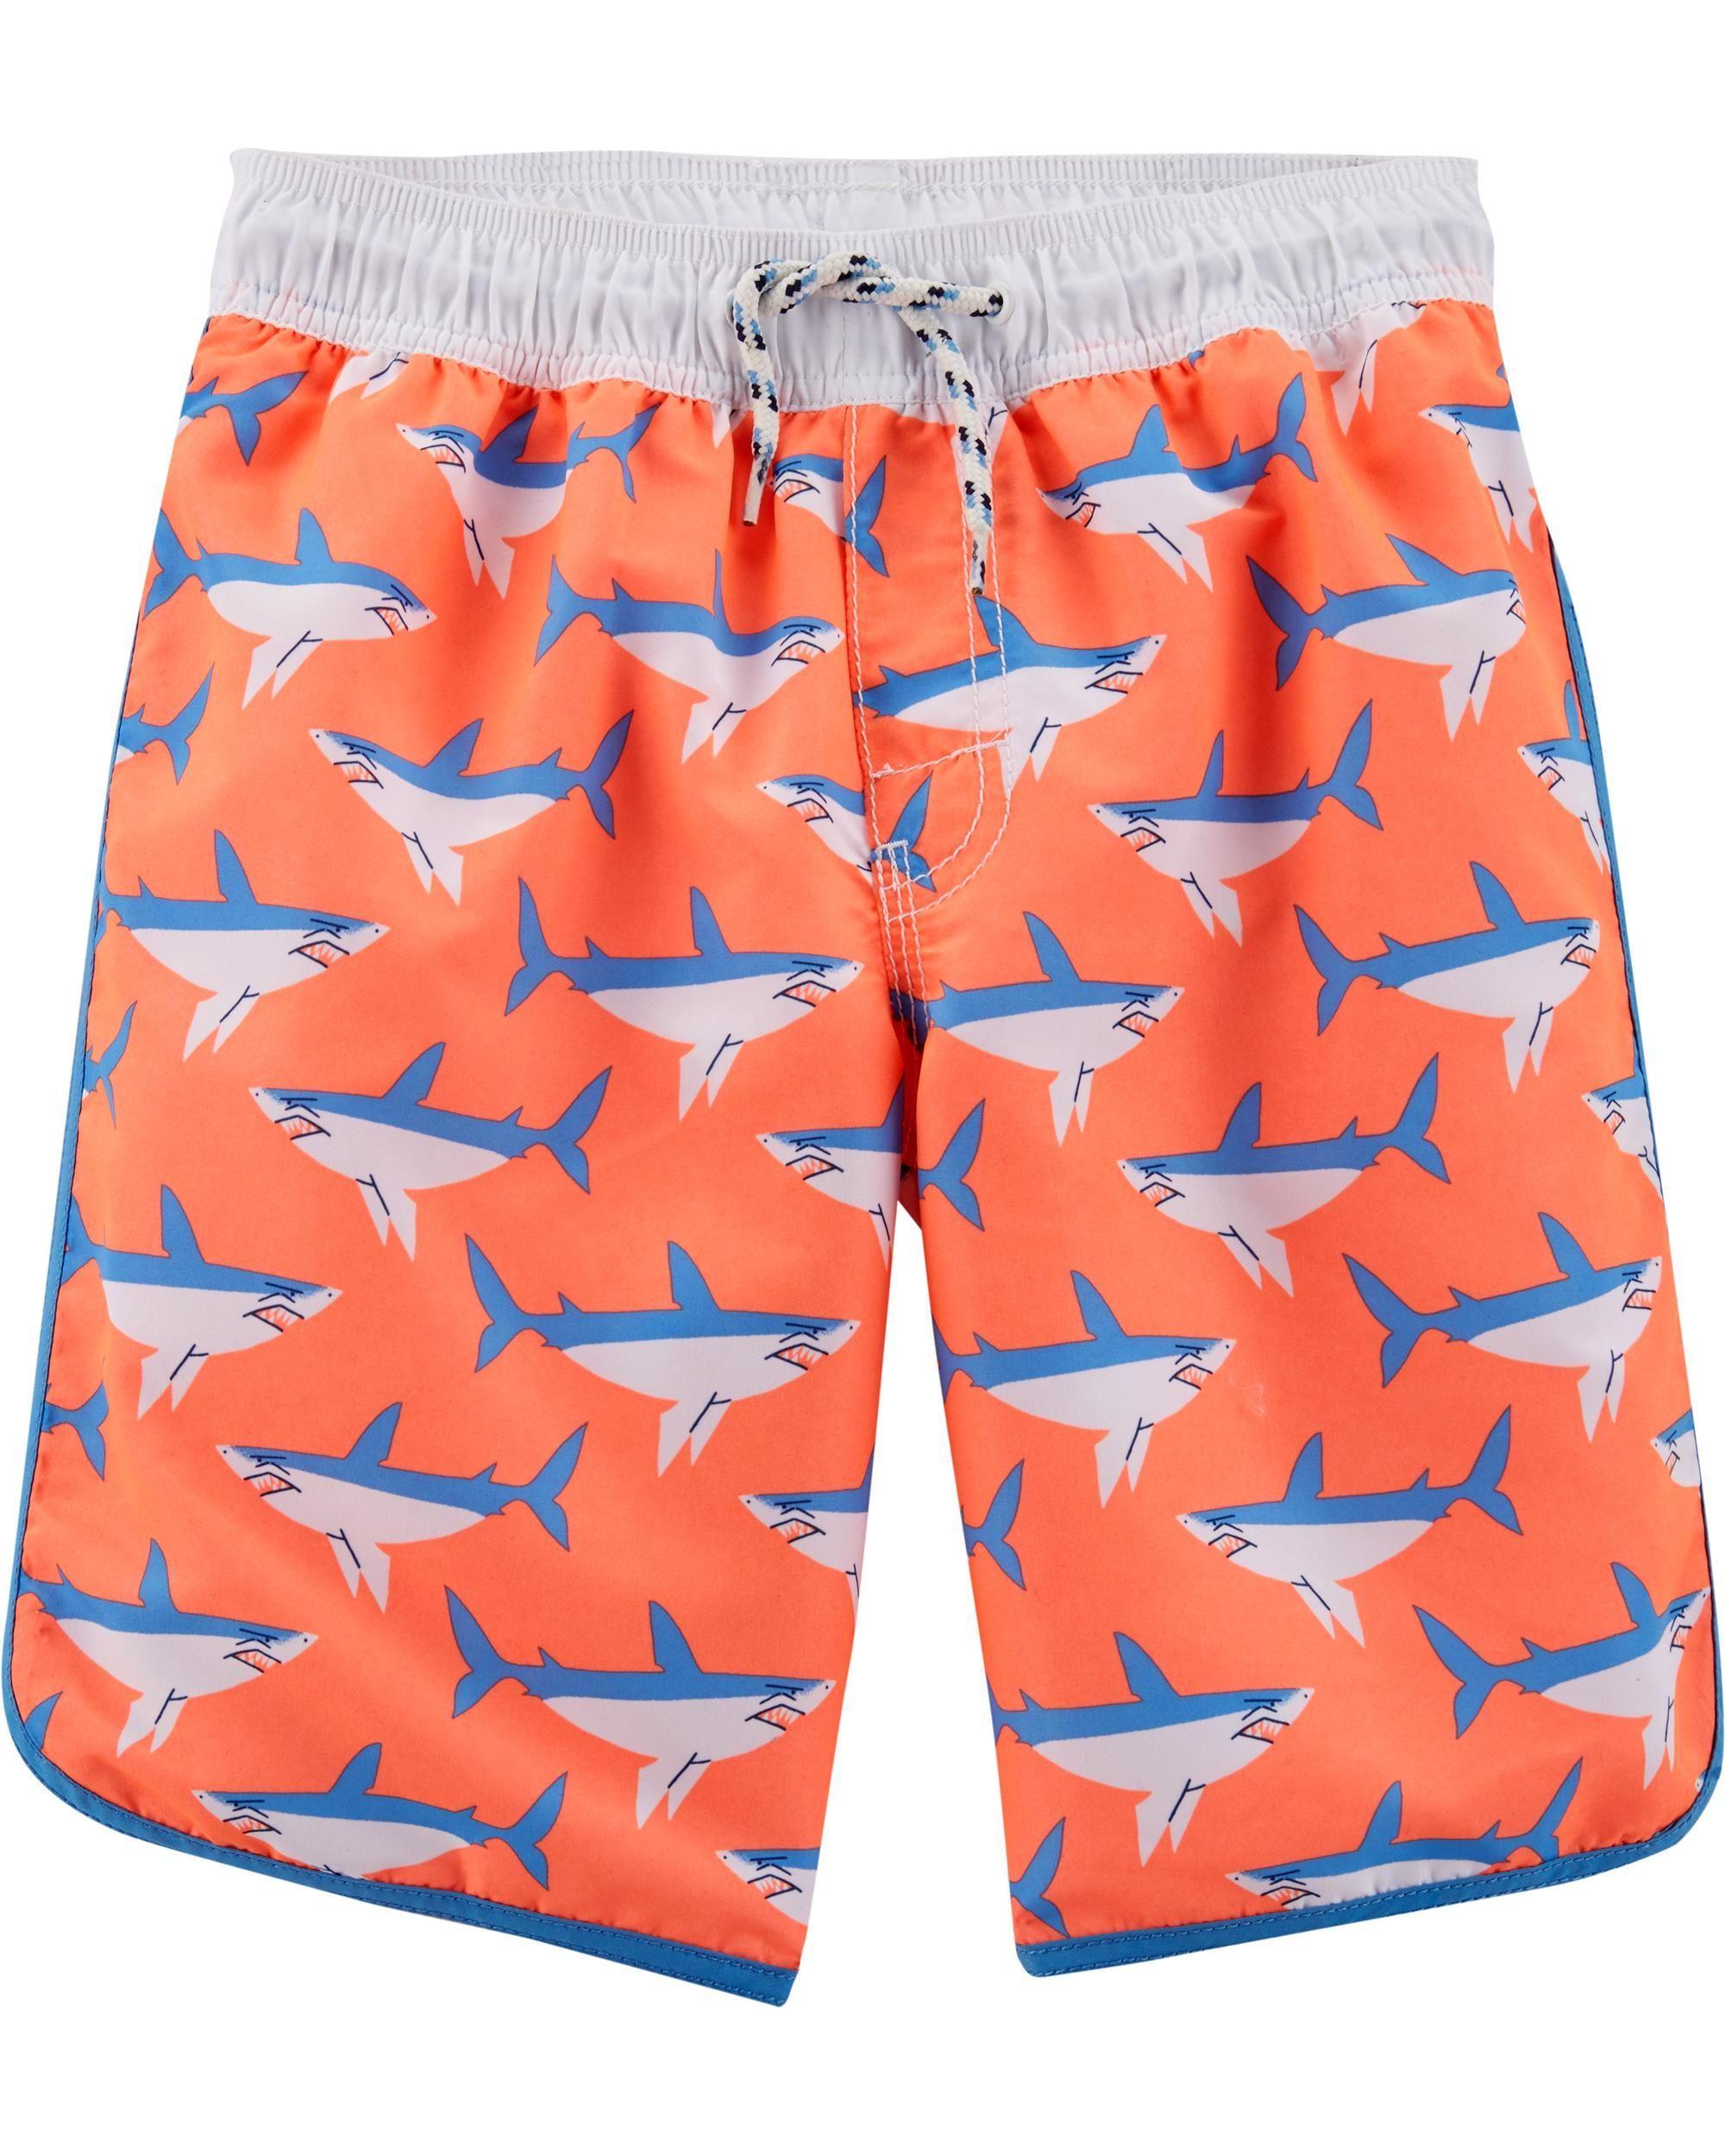 Boy Board Shorts Swimwear Adjustable Waist Pocket Swim Trunk Dolphin Blue Green